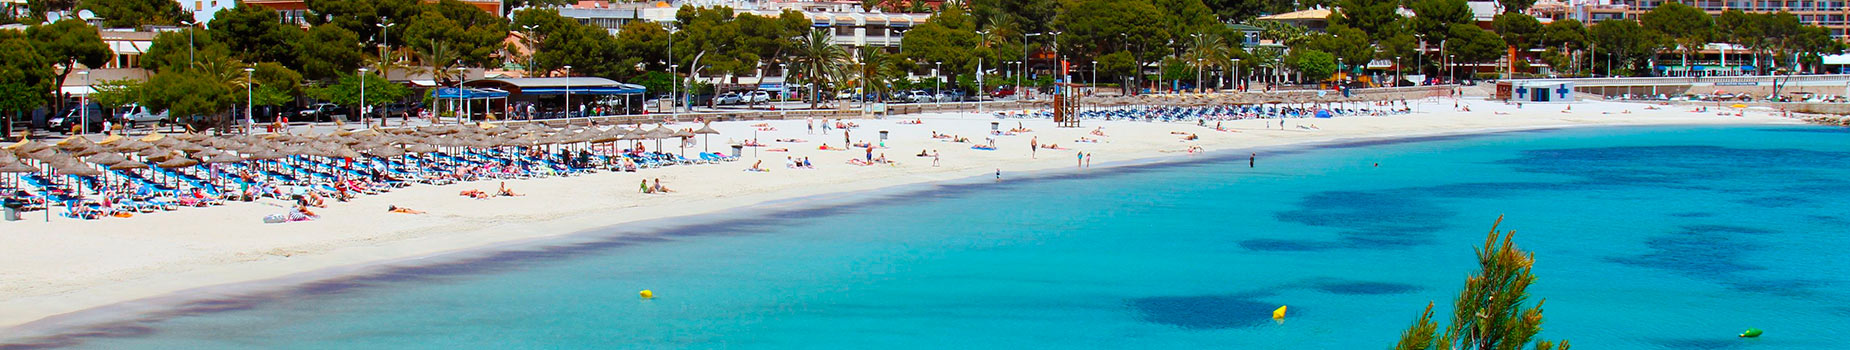 Vliegvakantie Mallorca